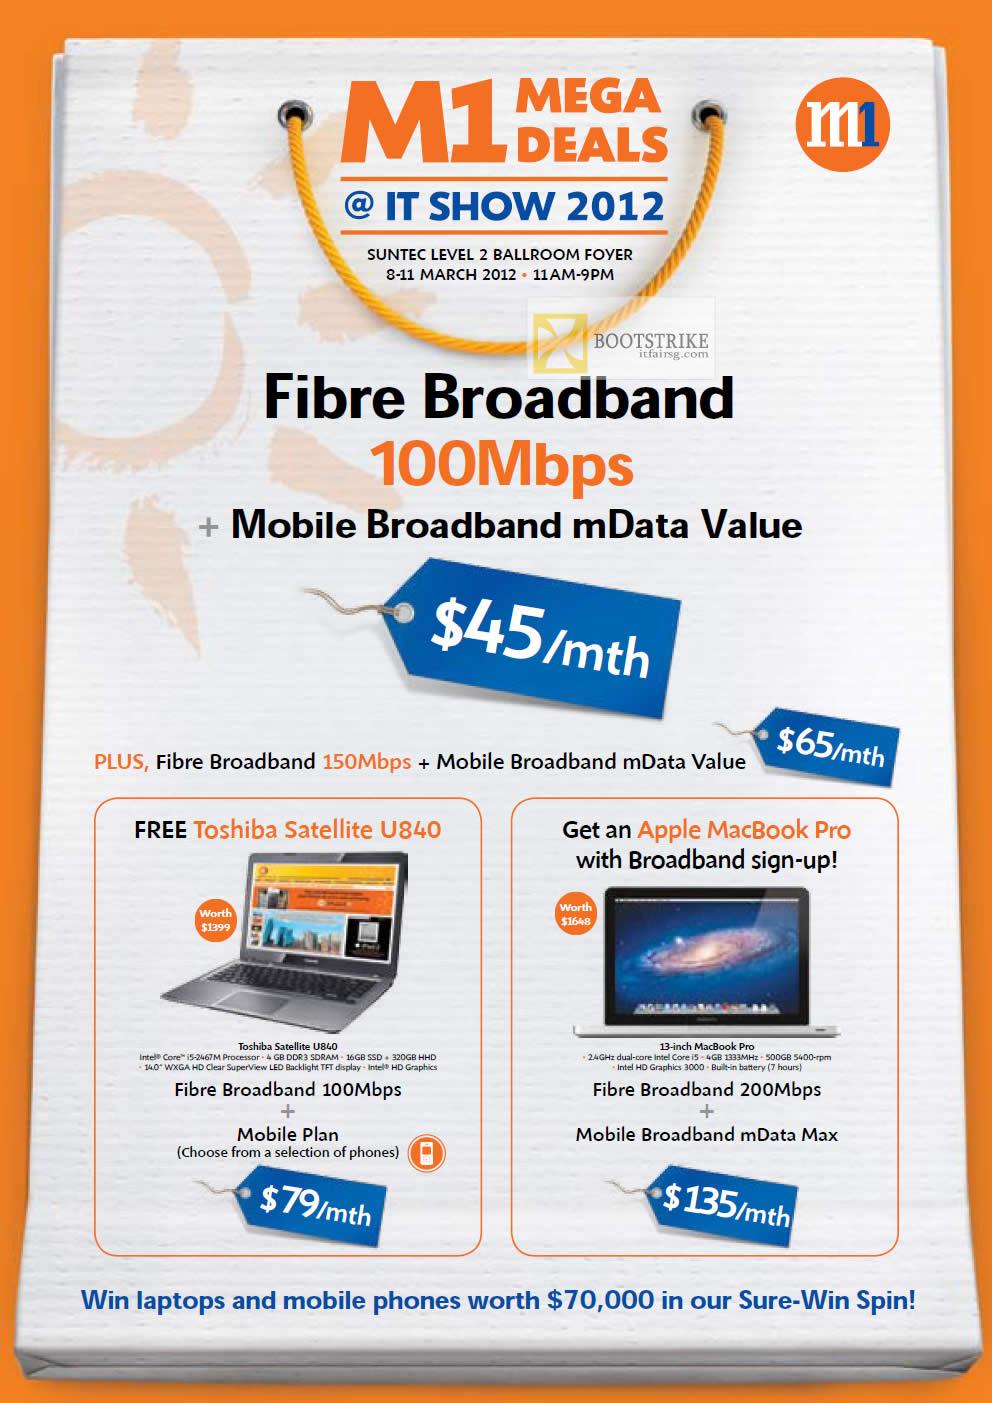 IT SHOW 2012 price list image brochure of M1 Broadband Fibre 100Mbps, MData Value, Toshiba Satellite U840 Notebook, Apple MacBook Pro, 200Mbps